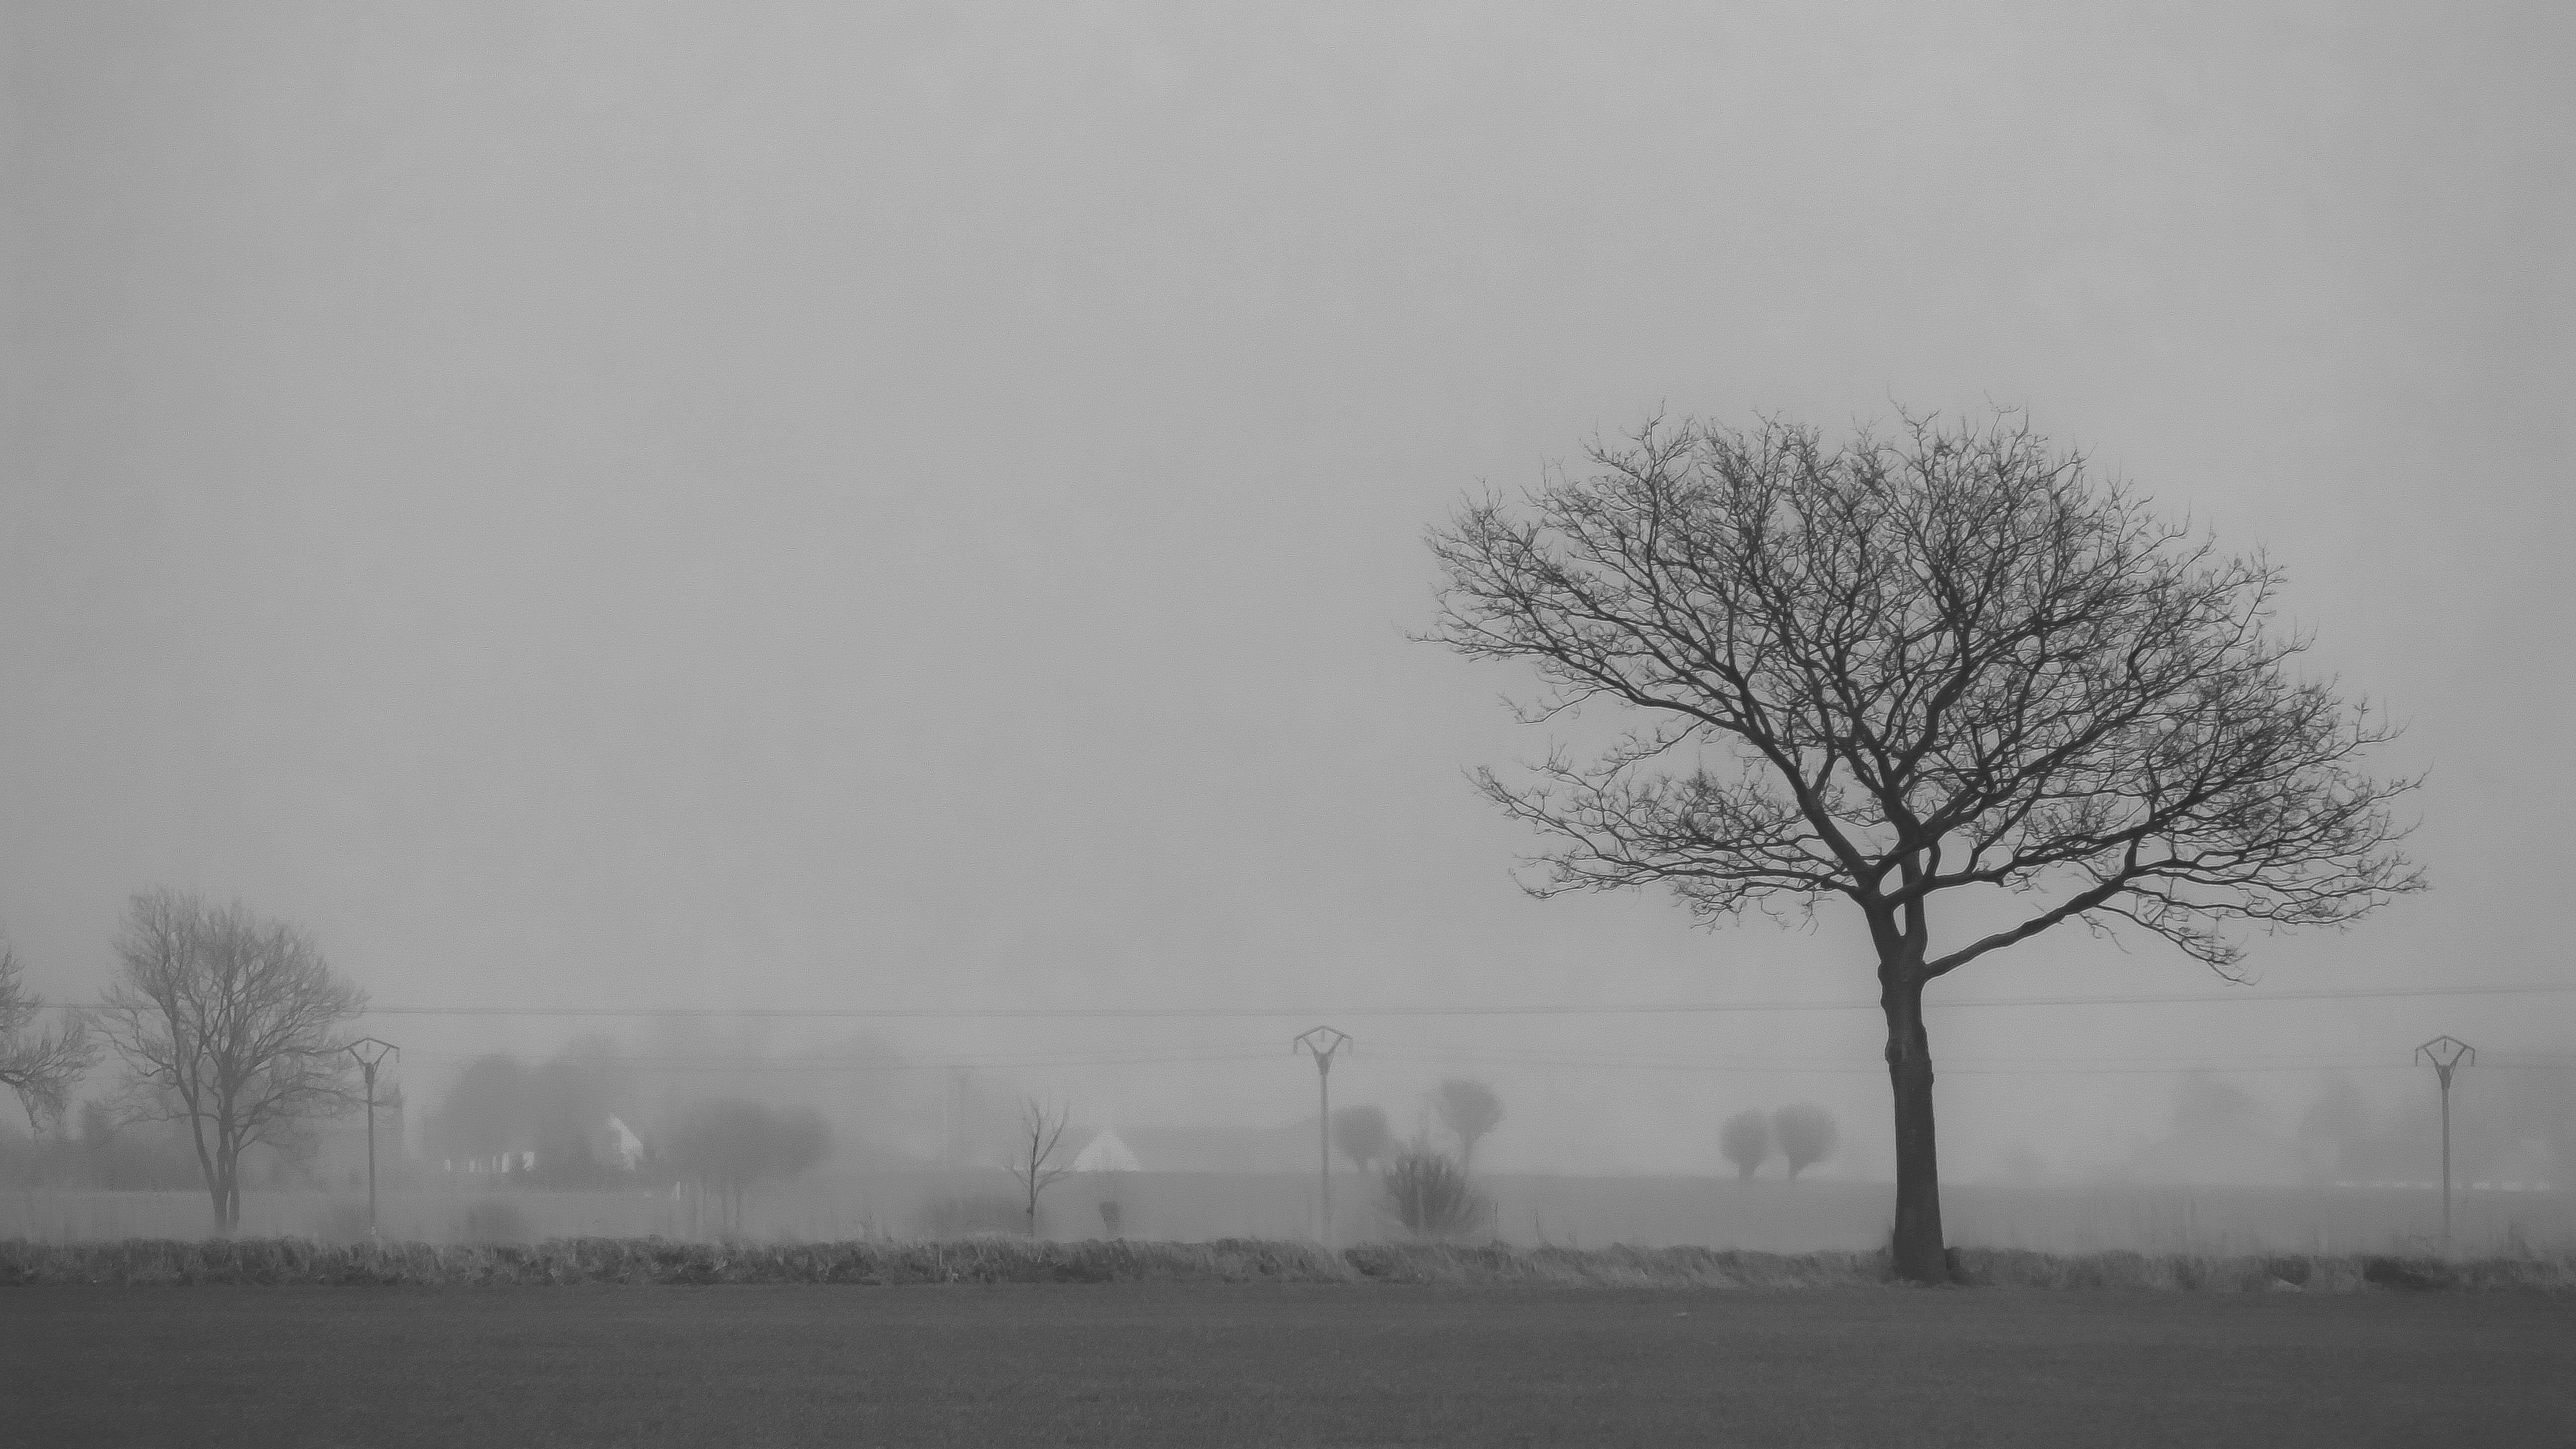 Landscape Monochrome Snow Winter Morning Mist Atmosphere Freezing Haze Tree Fog Weather Dawn Season Tr D